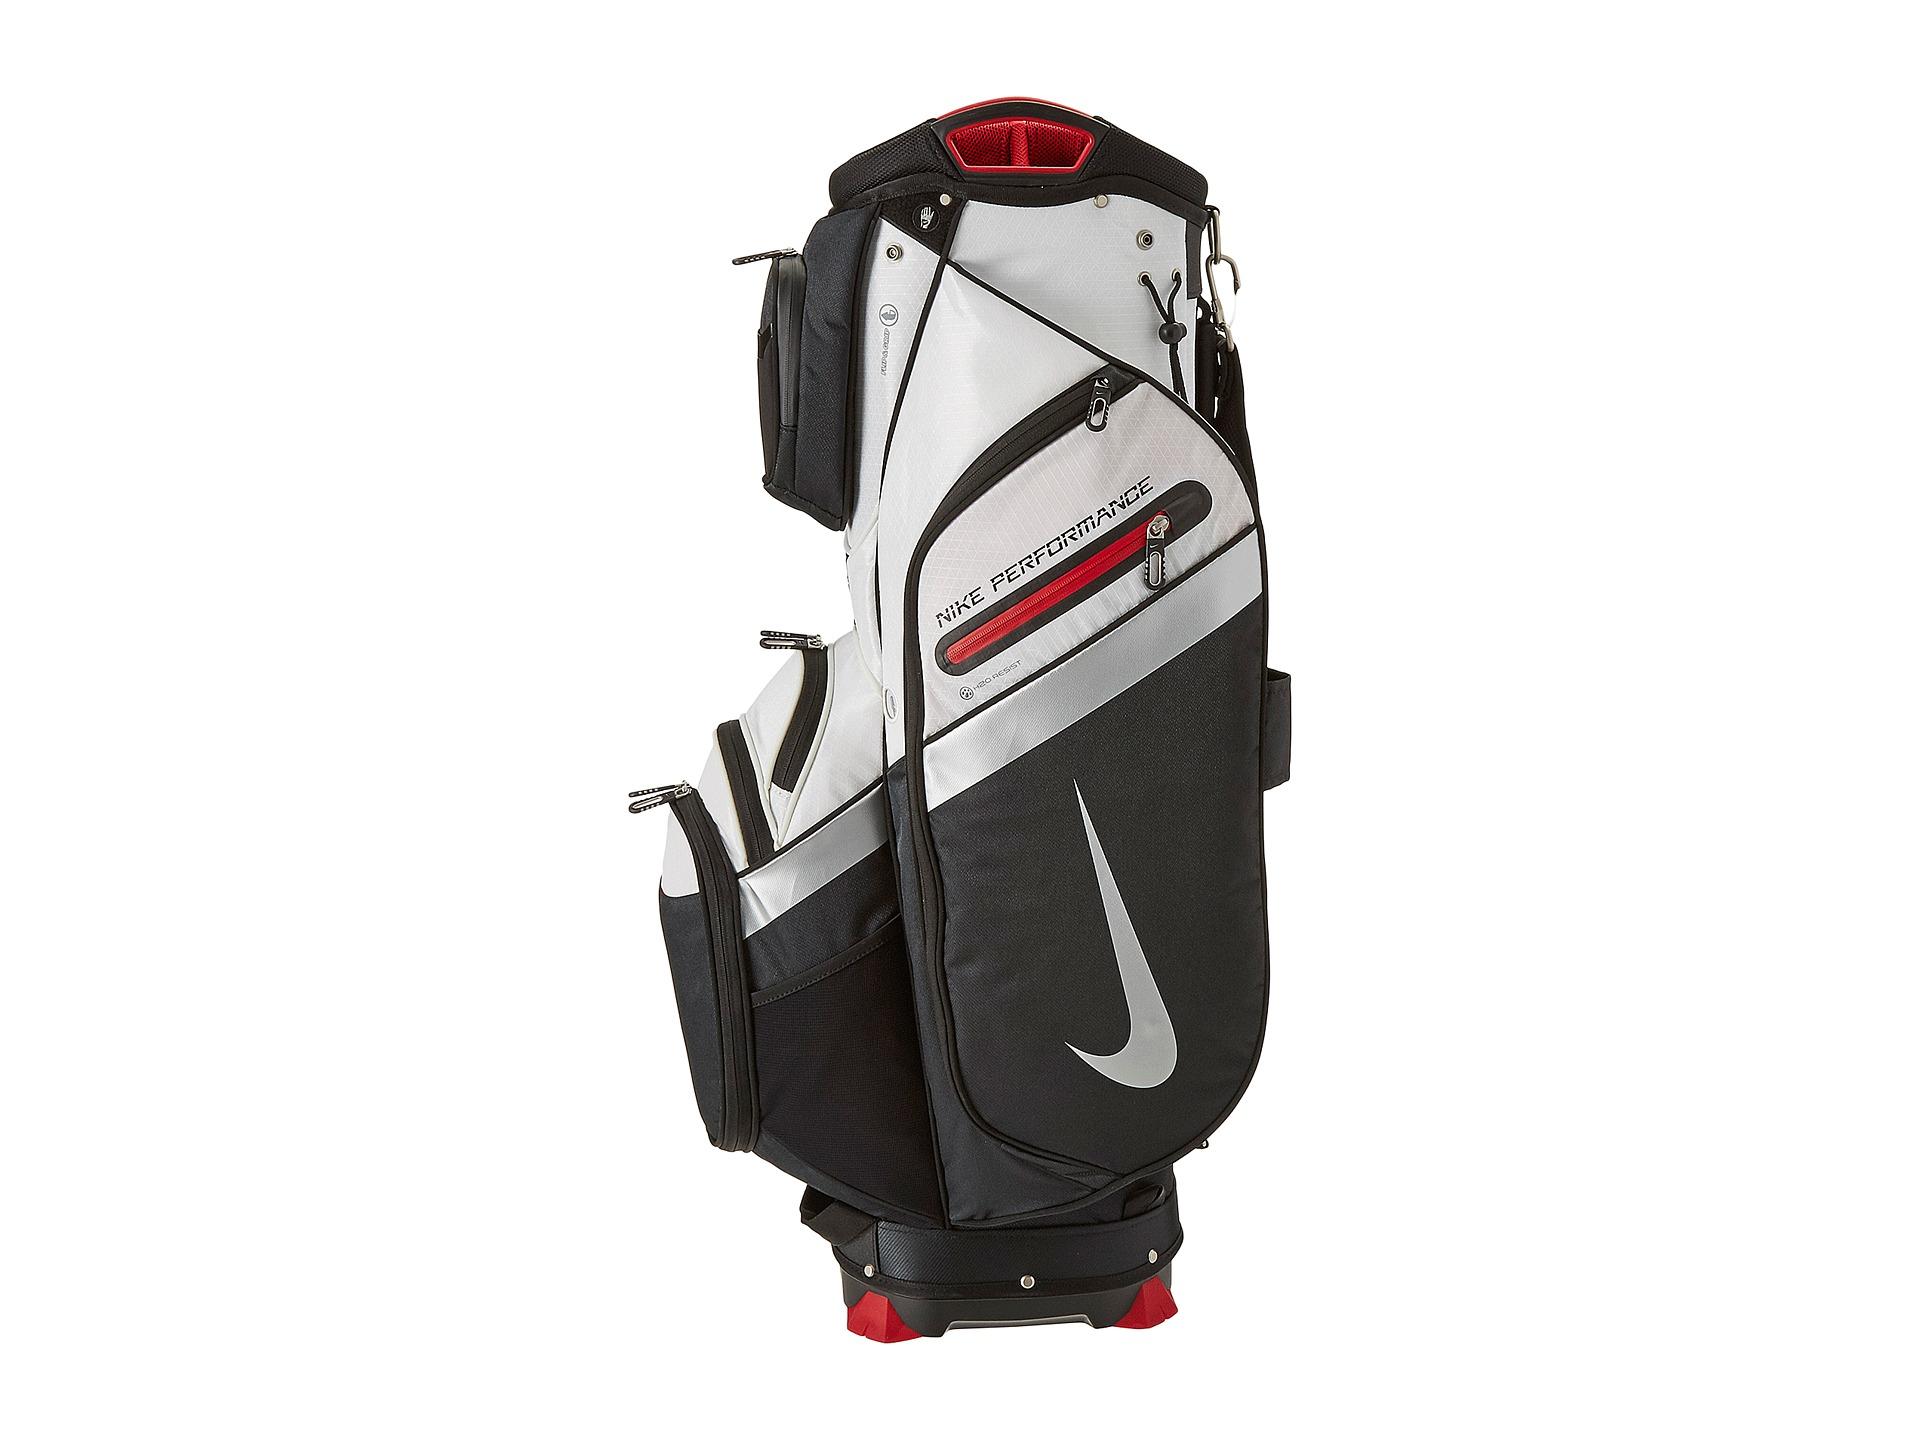 Lyst - Nike Performance Cart Iv in Metallic for Men 2c48eb08ffab0